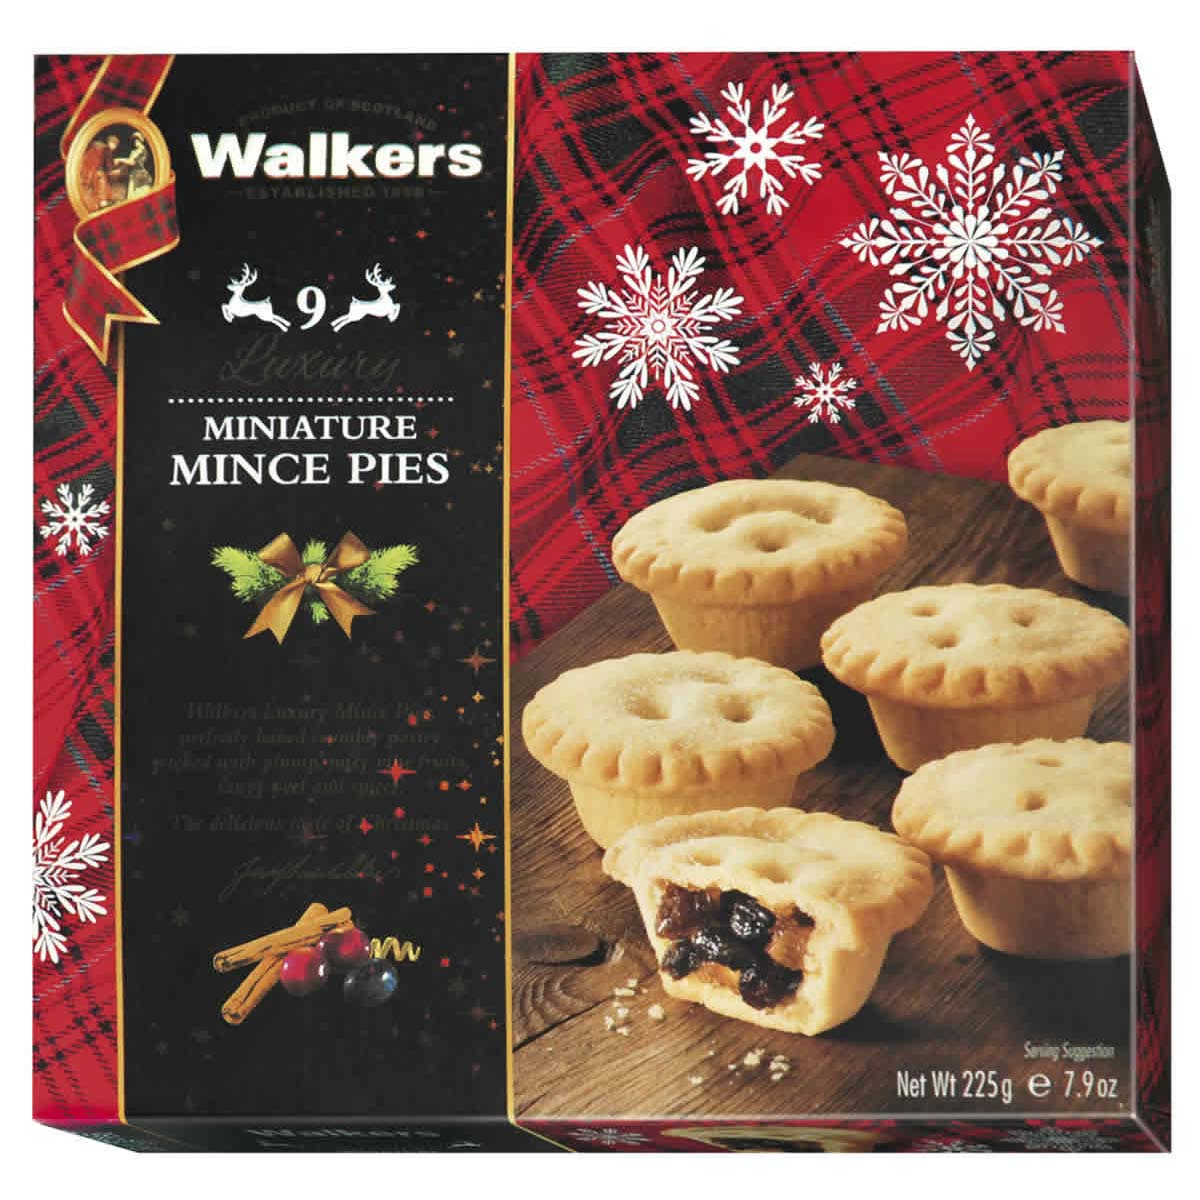 Top Food Feinkost - Walkers Shortbread Ltd. Luxury Mini Mince Pies 225g |kleine Buttergebäck-Törtchen